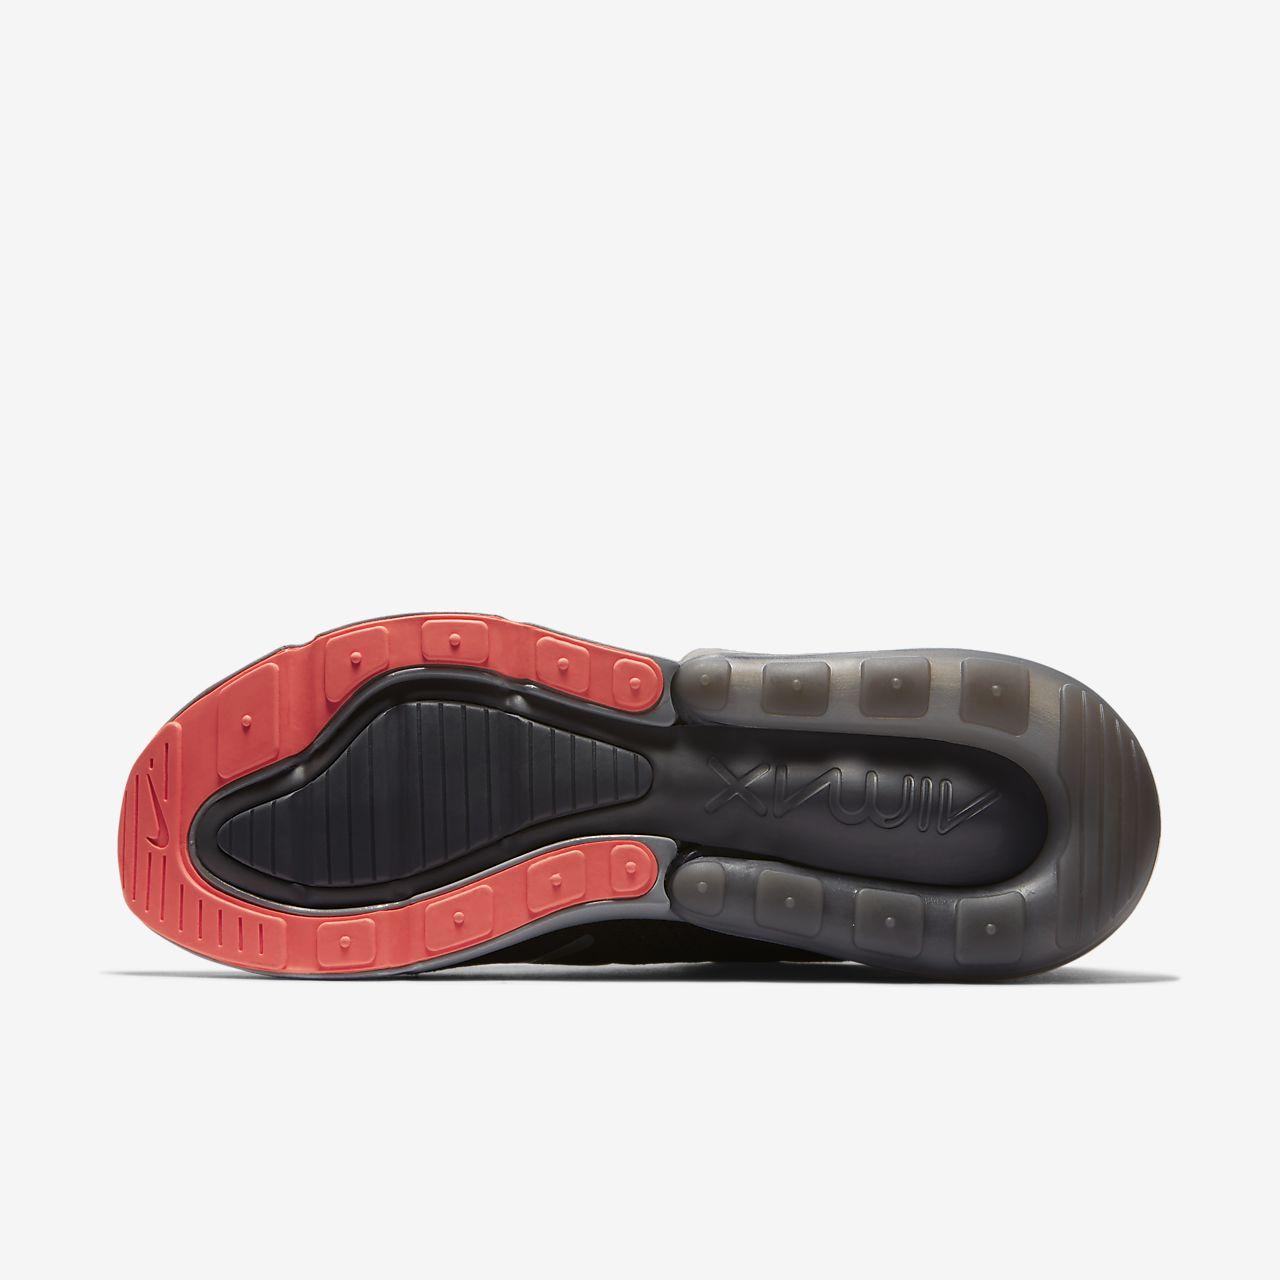 sale retailer 250ee 361a3 ... Nike Air Max 270 Flyknit Sabatilles - Home